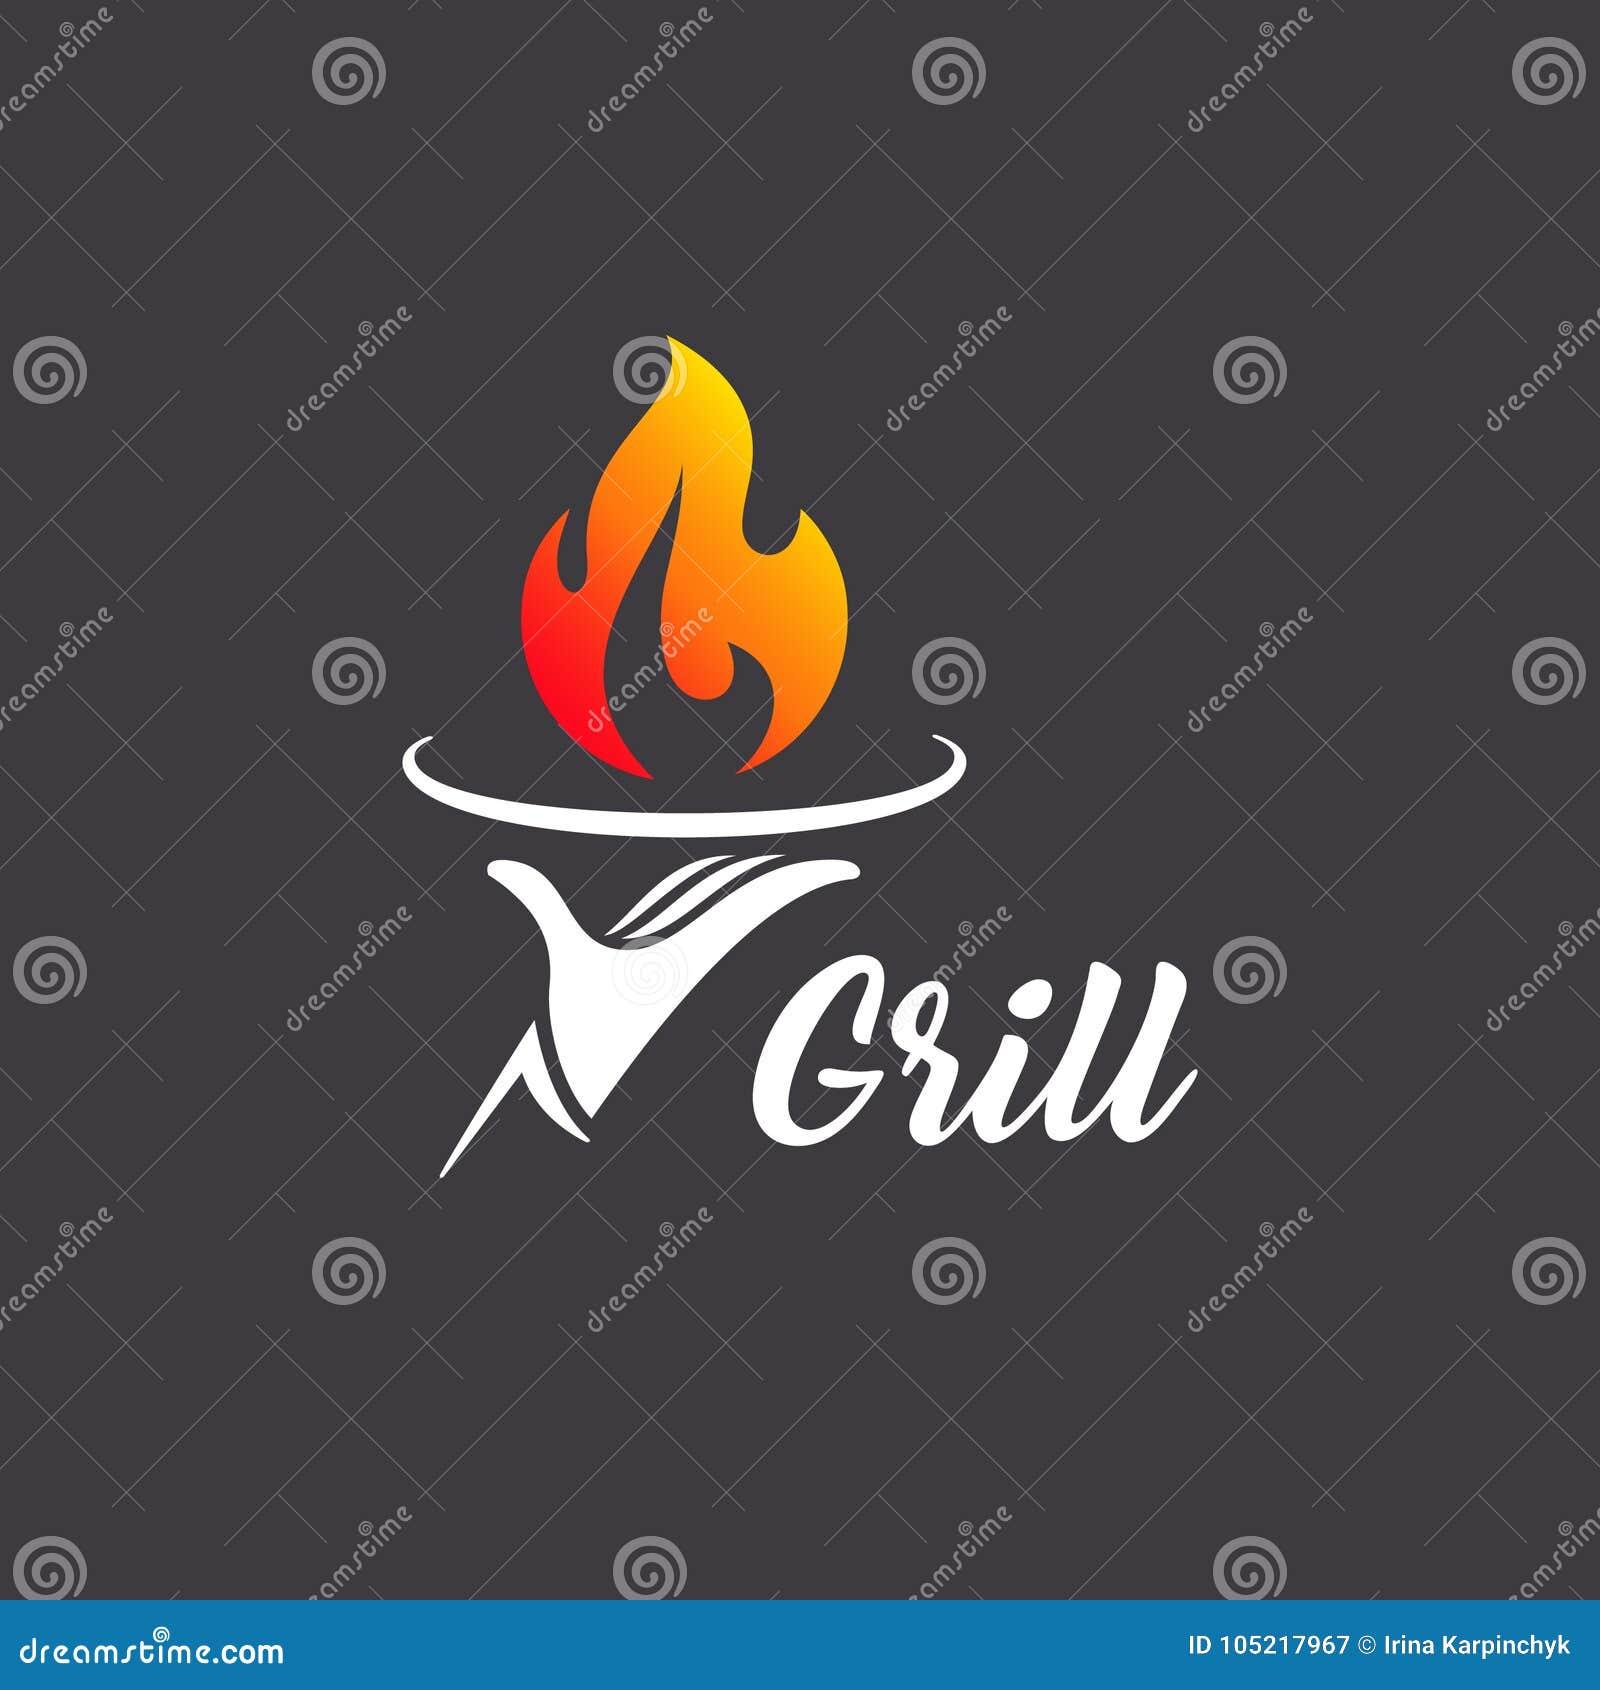 Vector logo design grill restaurant. Grilling. Barbecue